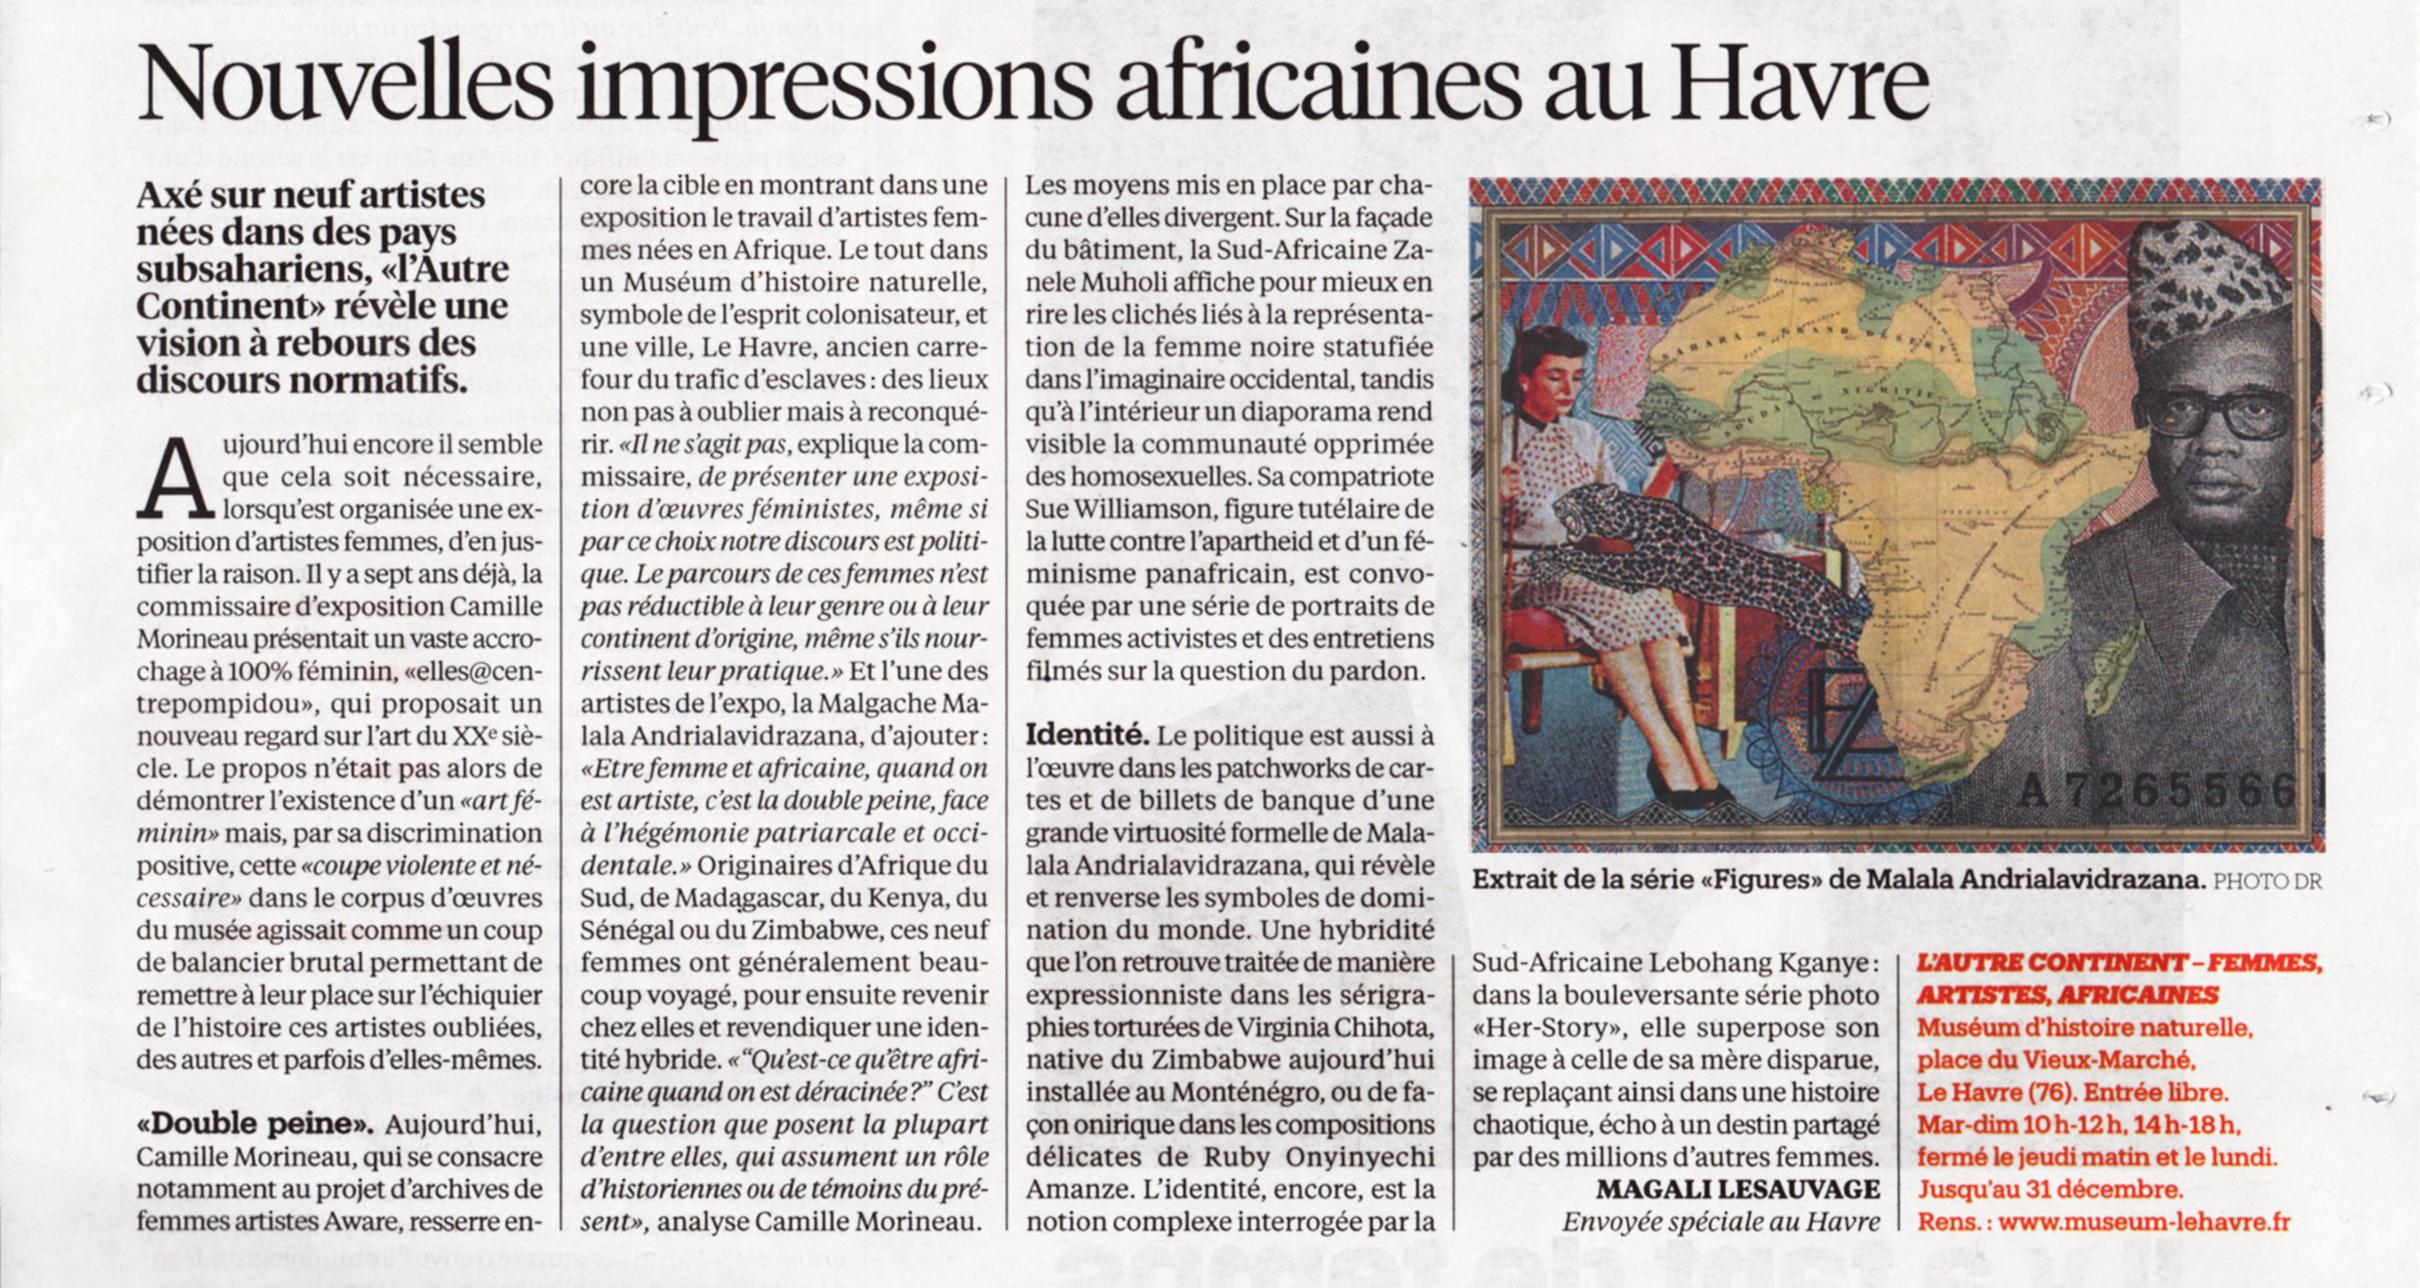 Nouvelles impressions africaines au Havre